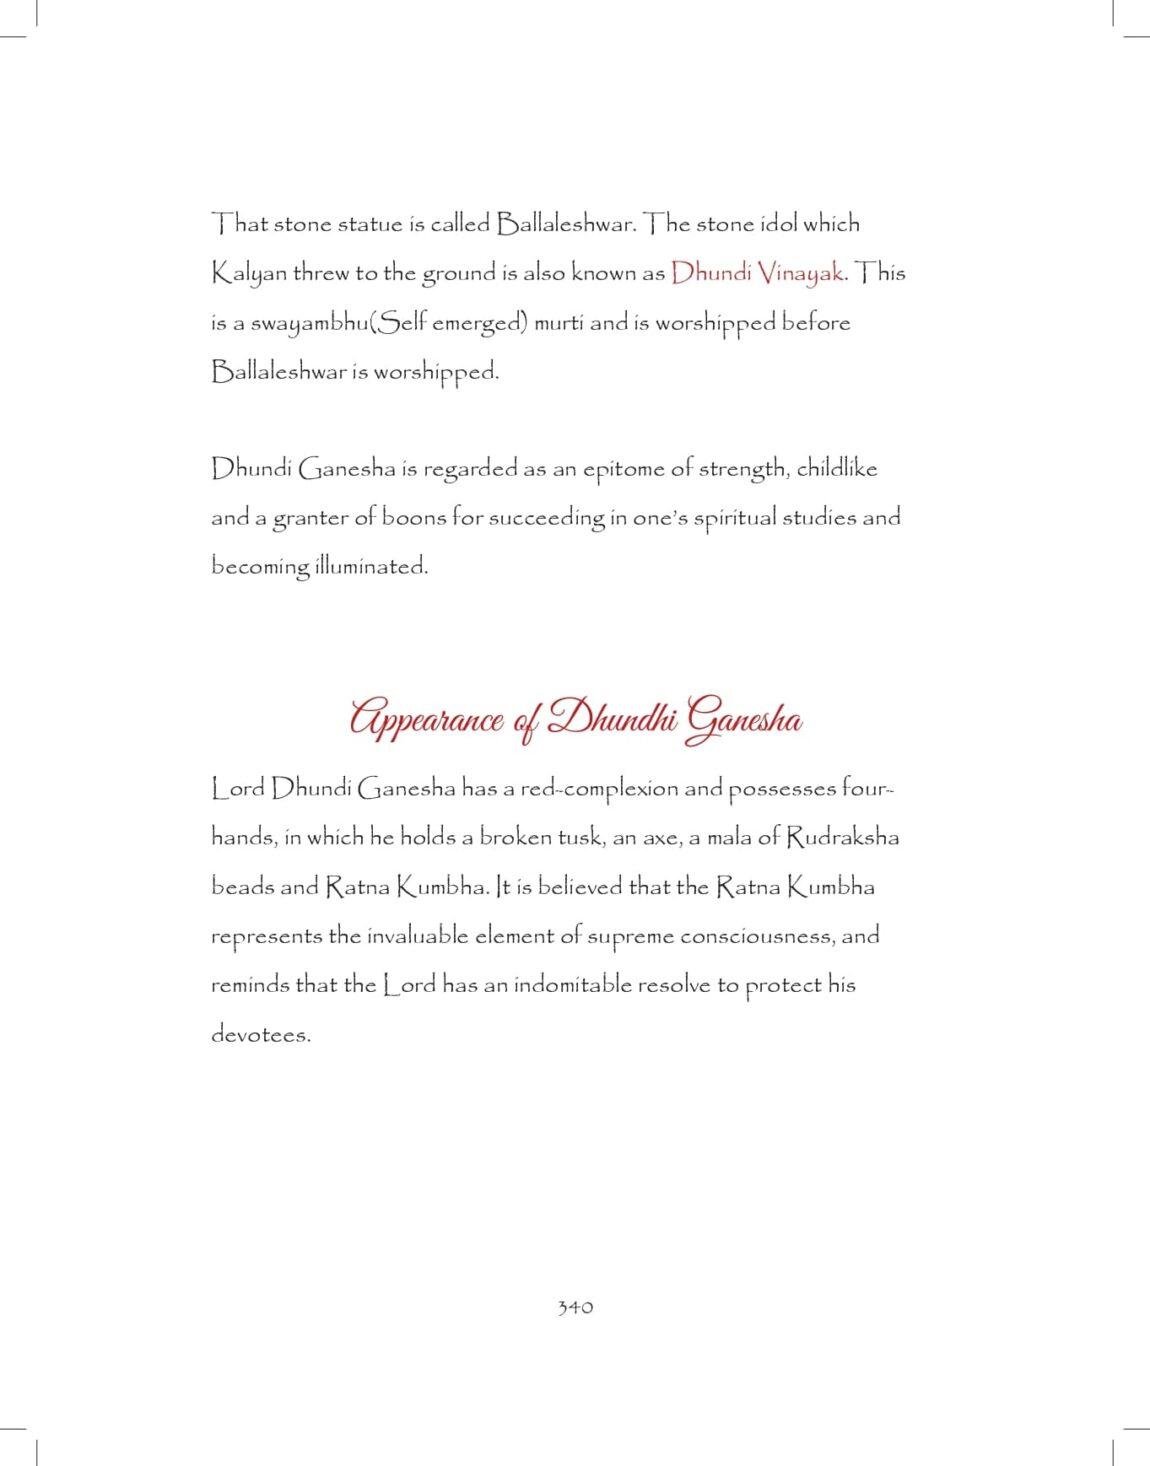 Ganesh-print_pages-to-jpg-0340.jpg